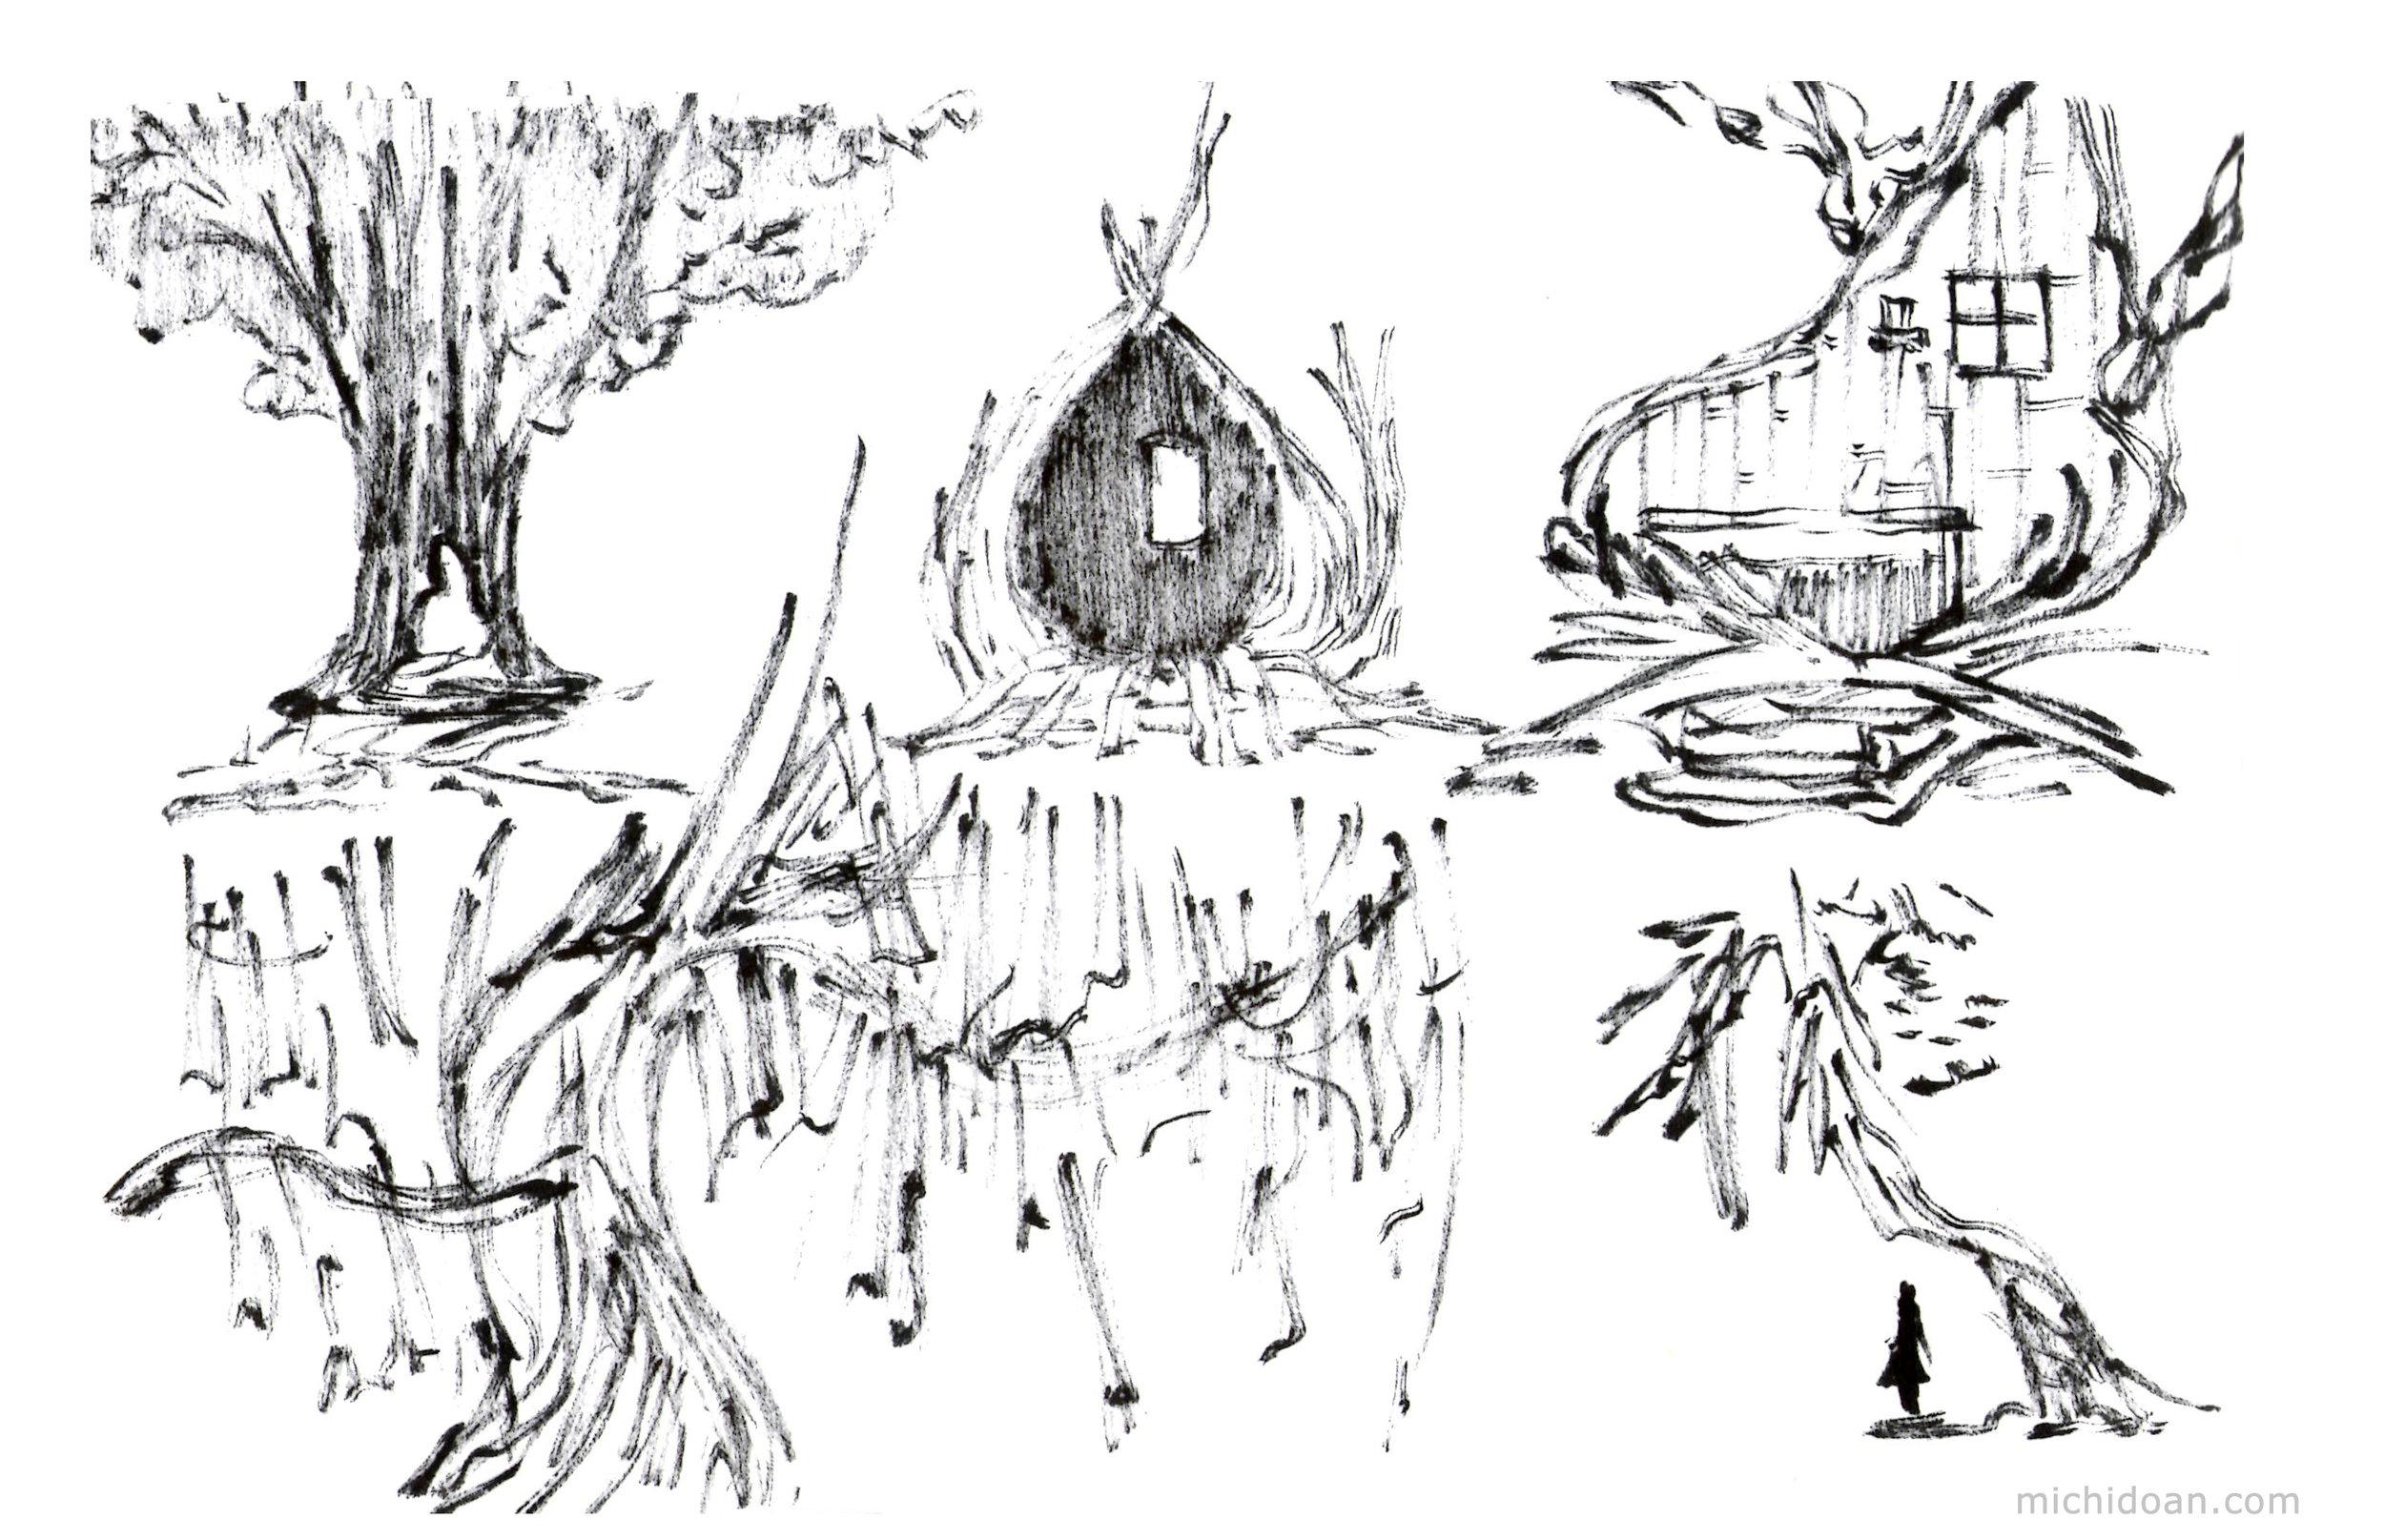 004_treesketch.jpg